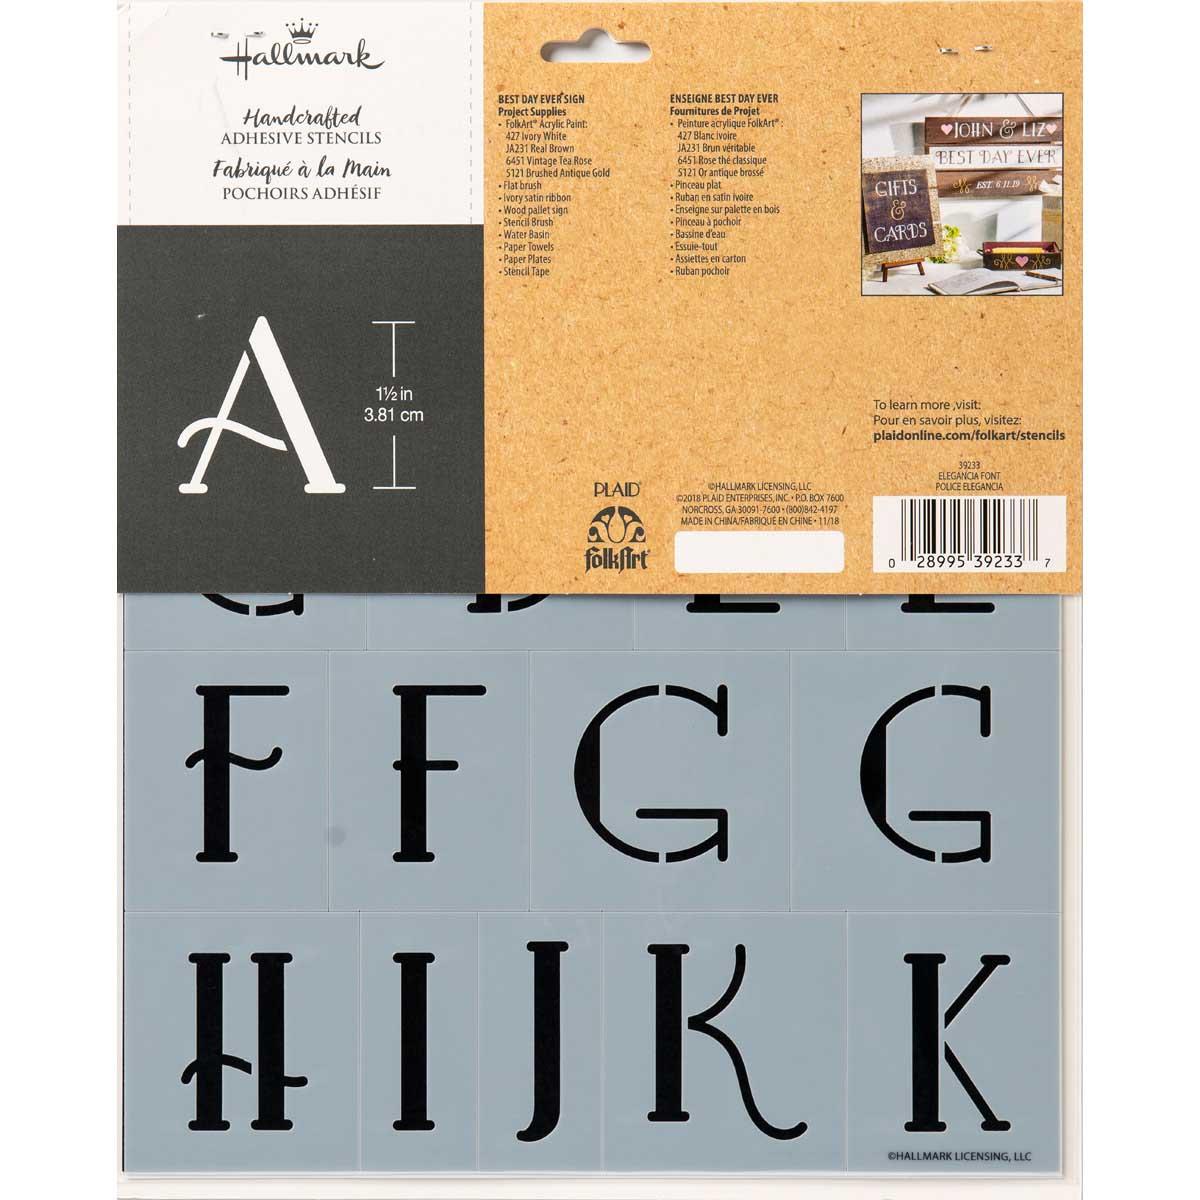 Hallmark Handcrafted Adhesive Stencils - Elegancia Font, 8-1/2